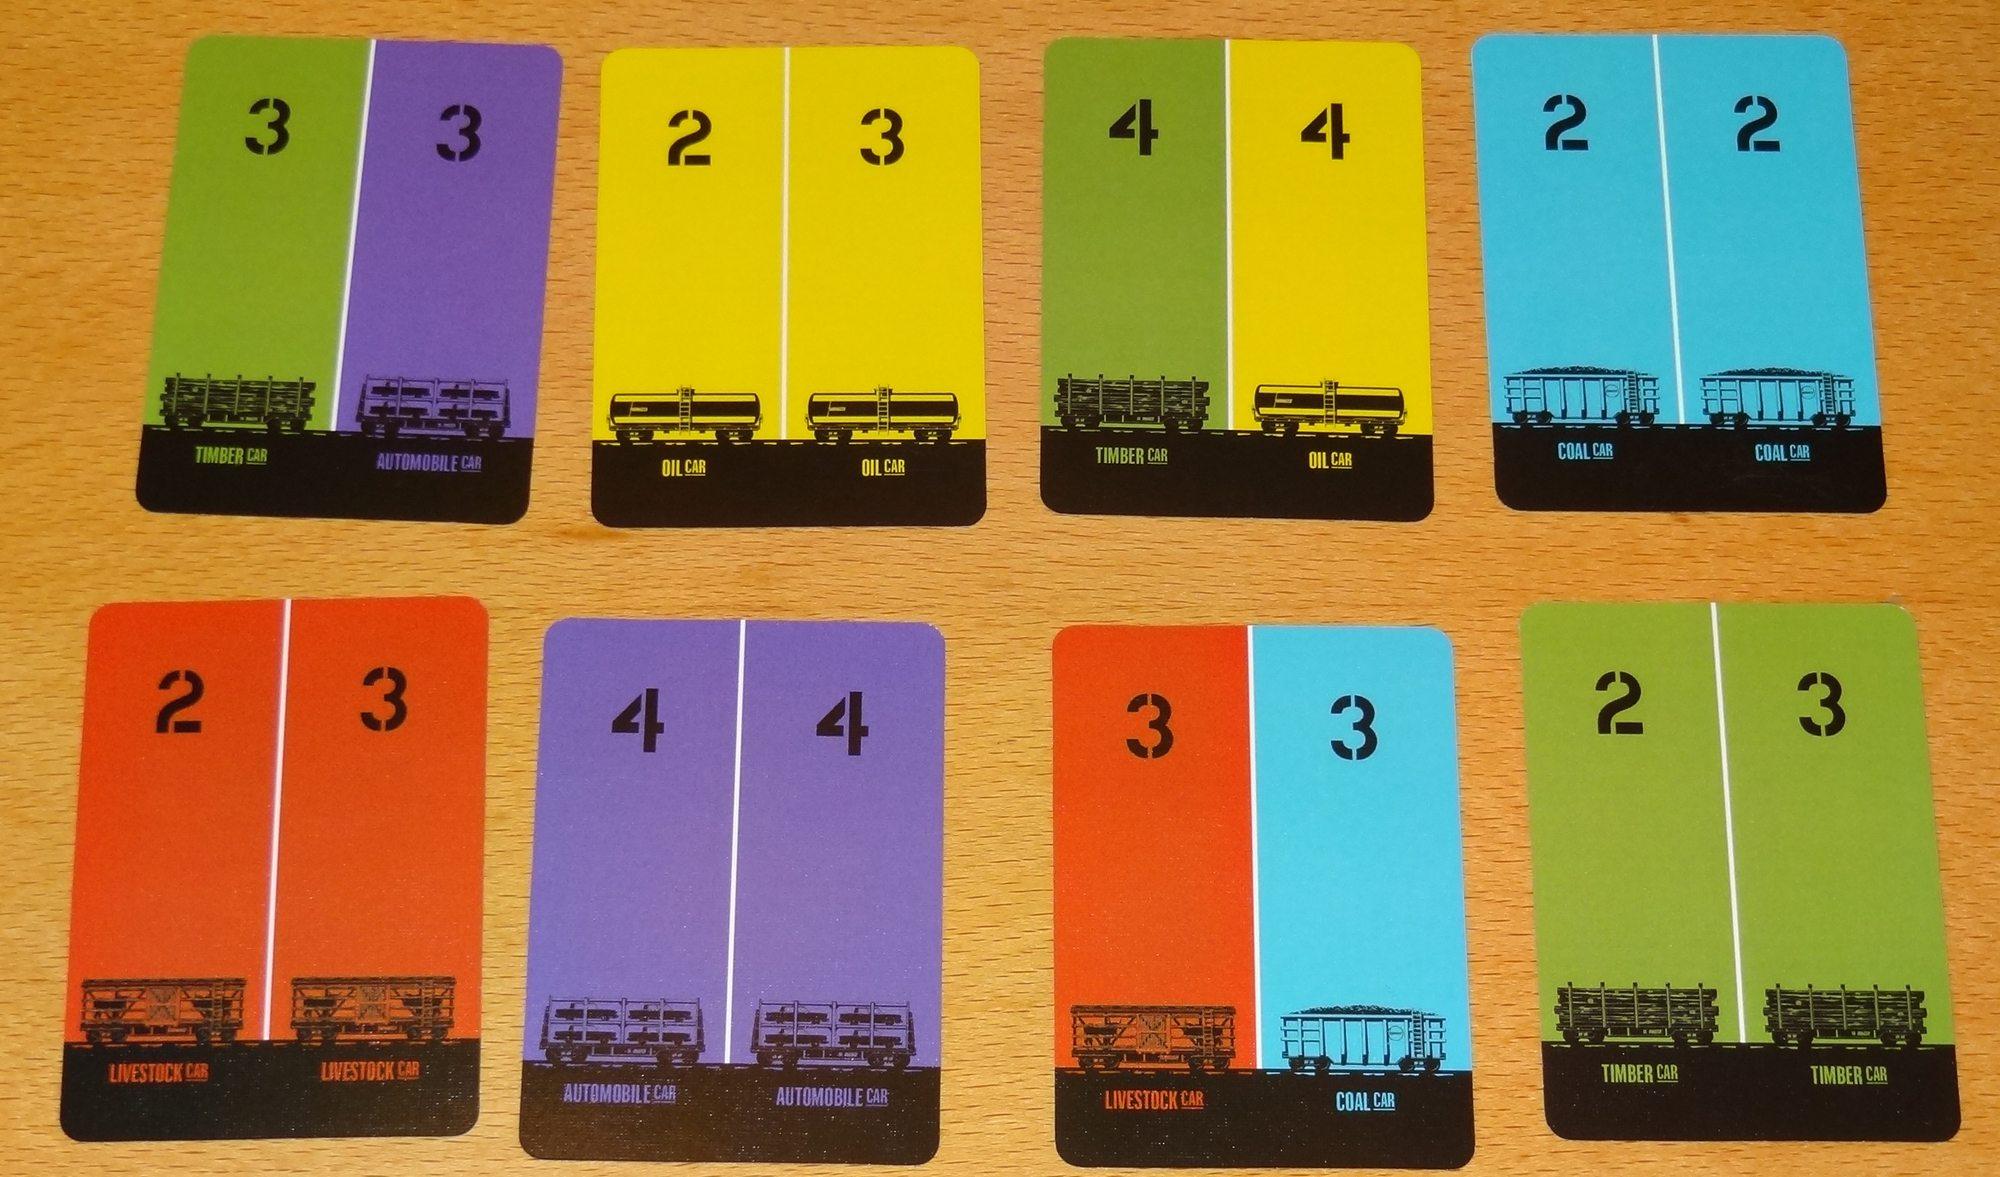 Yardmaster Express - Railcar cards